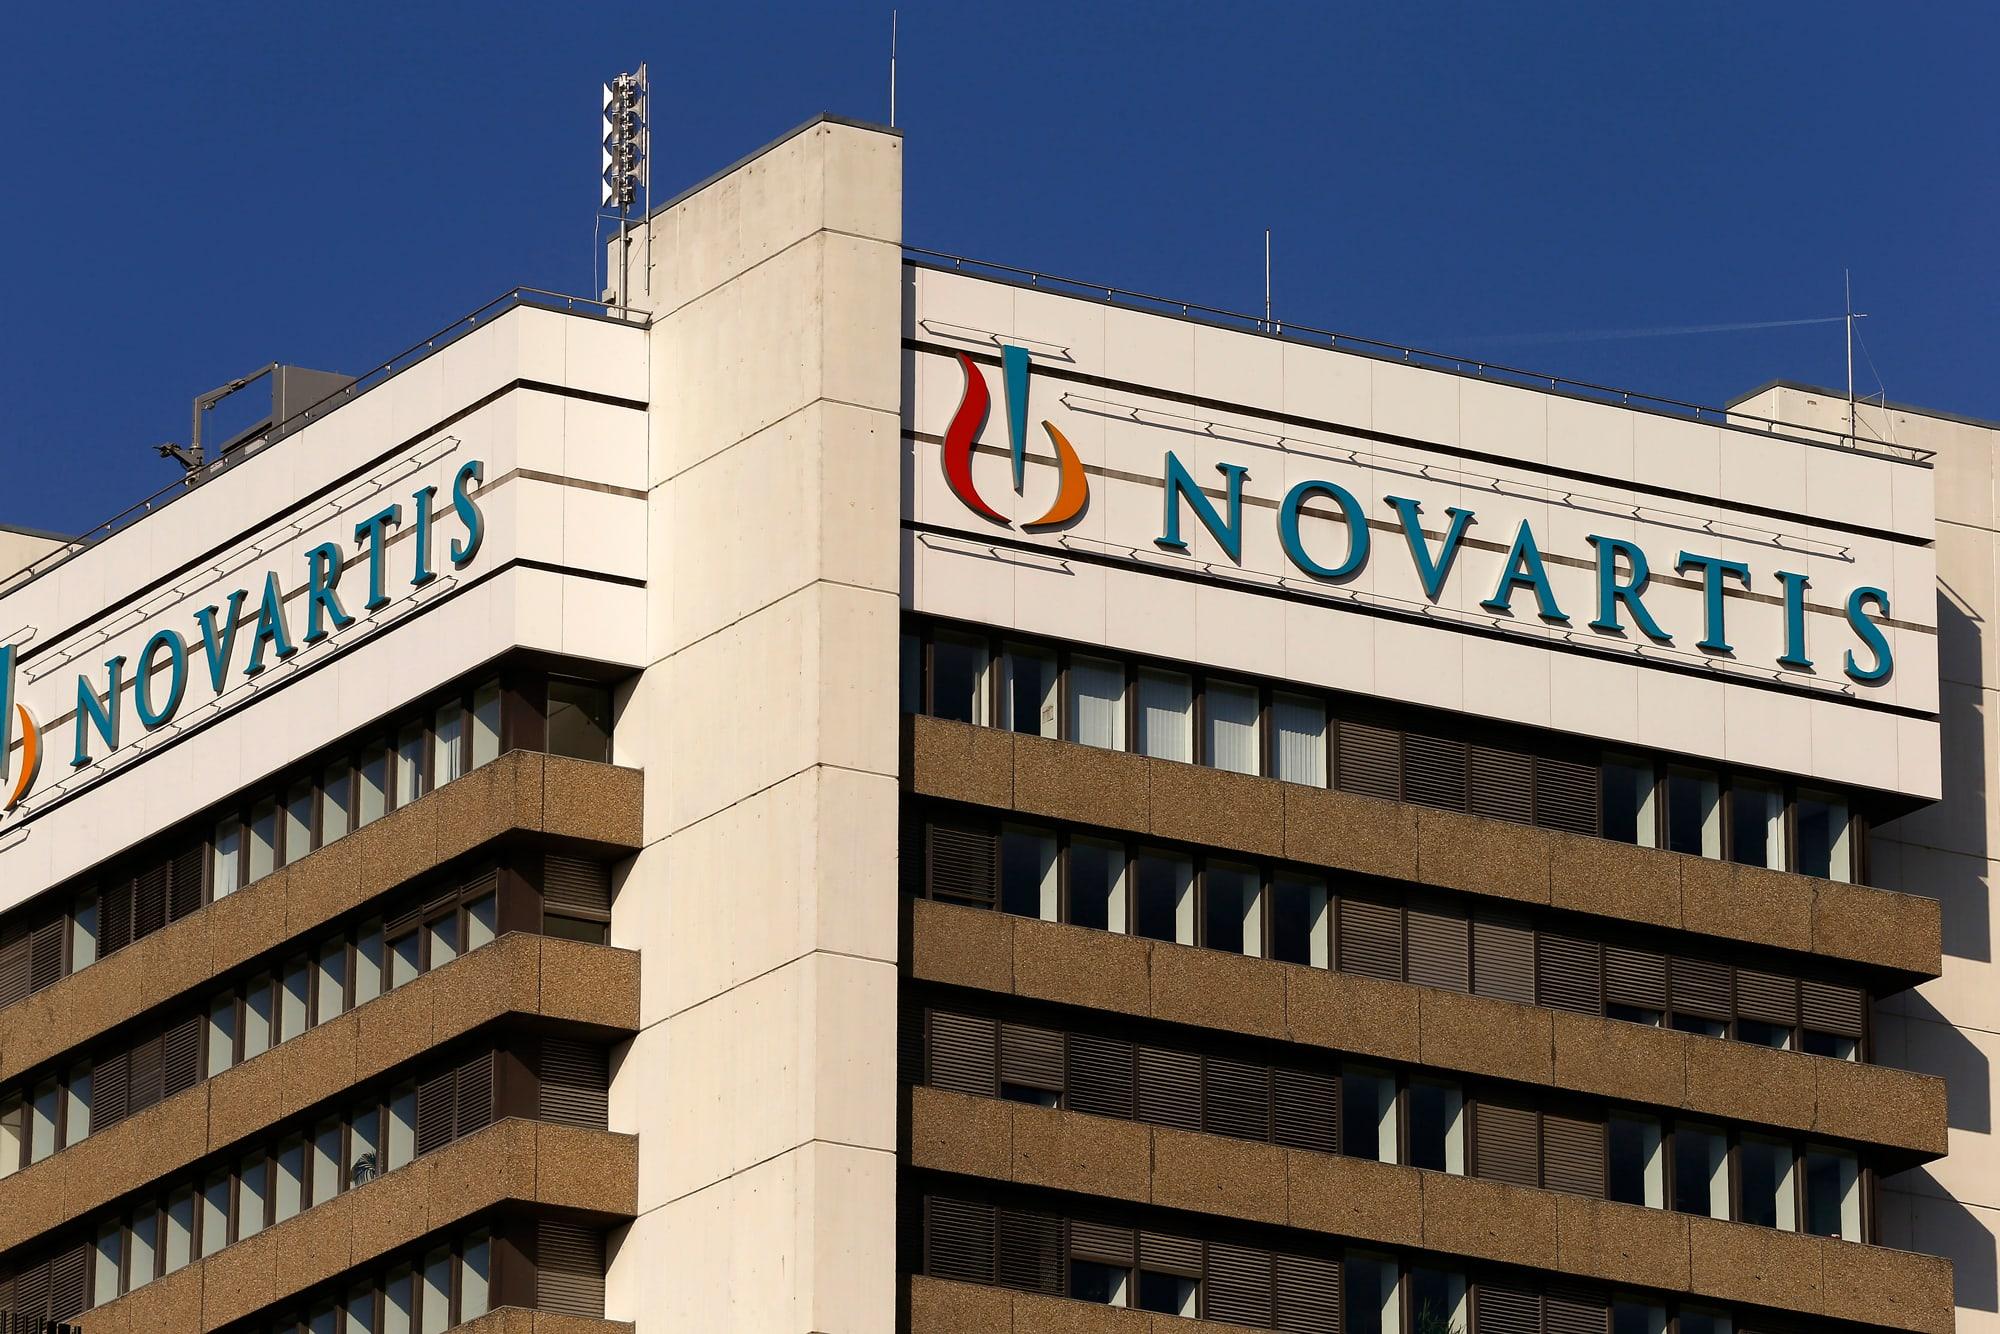 Novartis pays $729 million to settle U.S. kickback charges